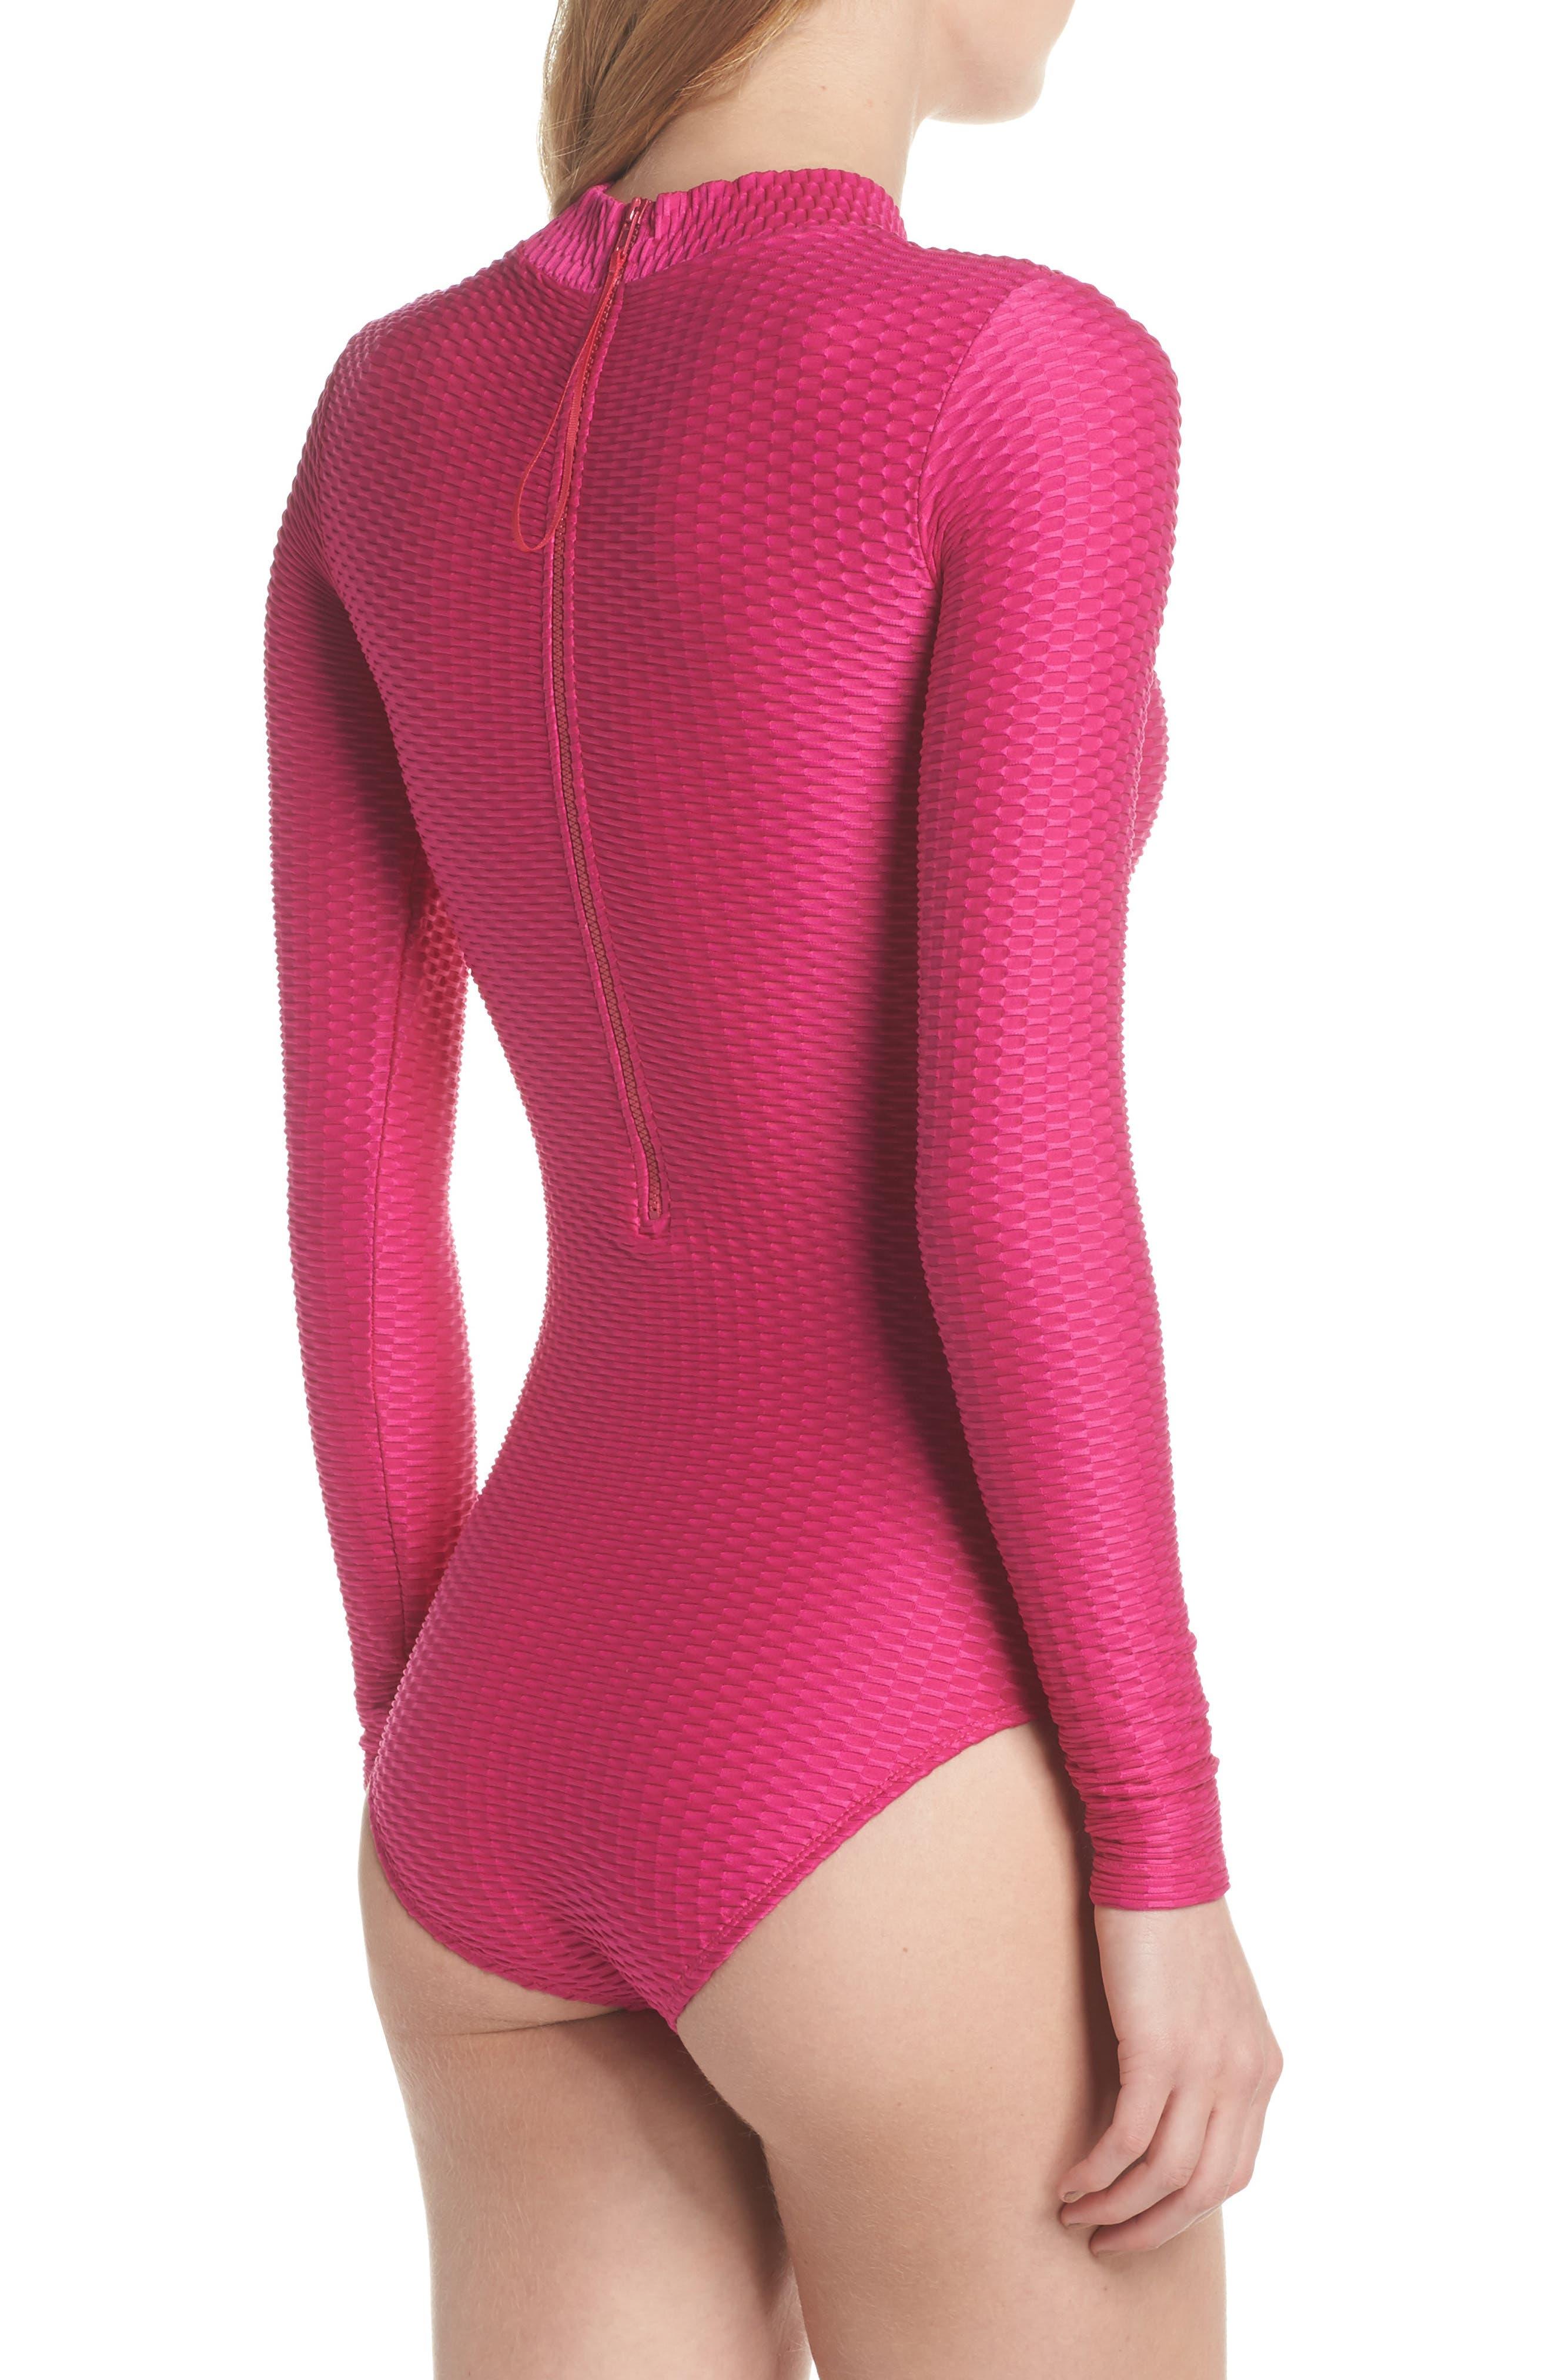 Long Sleeve One-Piece Swimsuit,                             Alternate thumbnail 2, color,                             Fuchsia